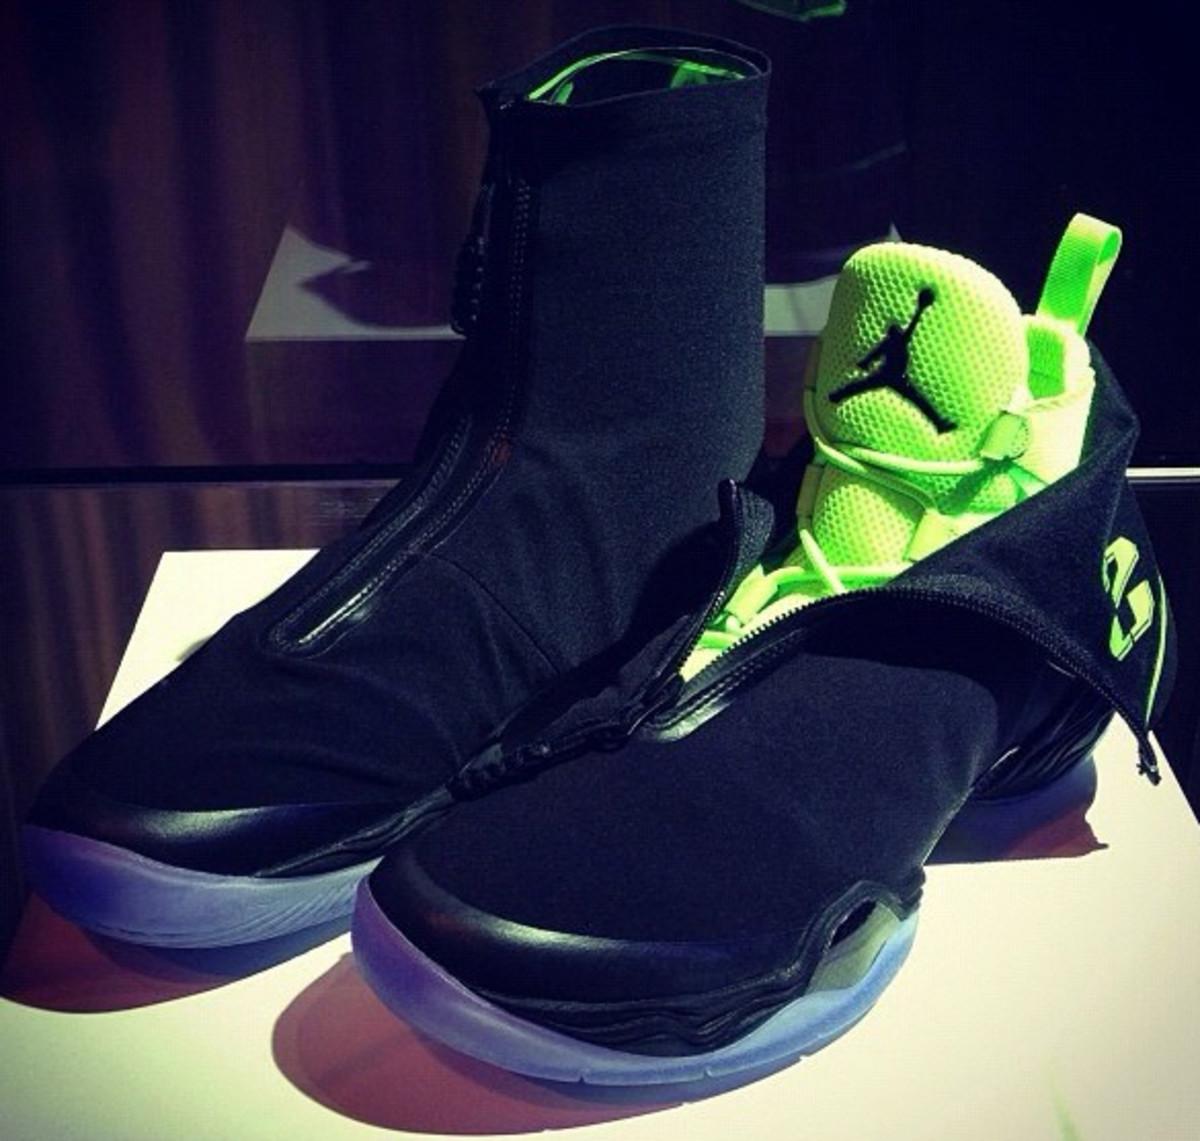 Nike unveils 'crazy' Air Jordan XX8